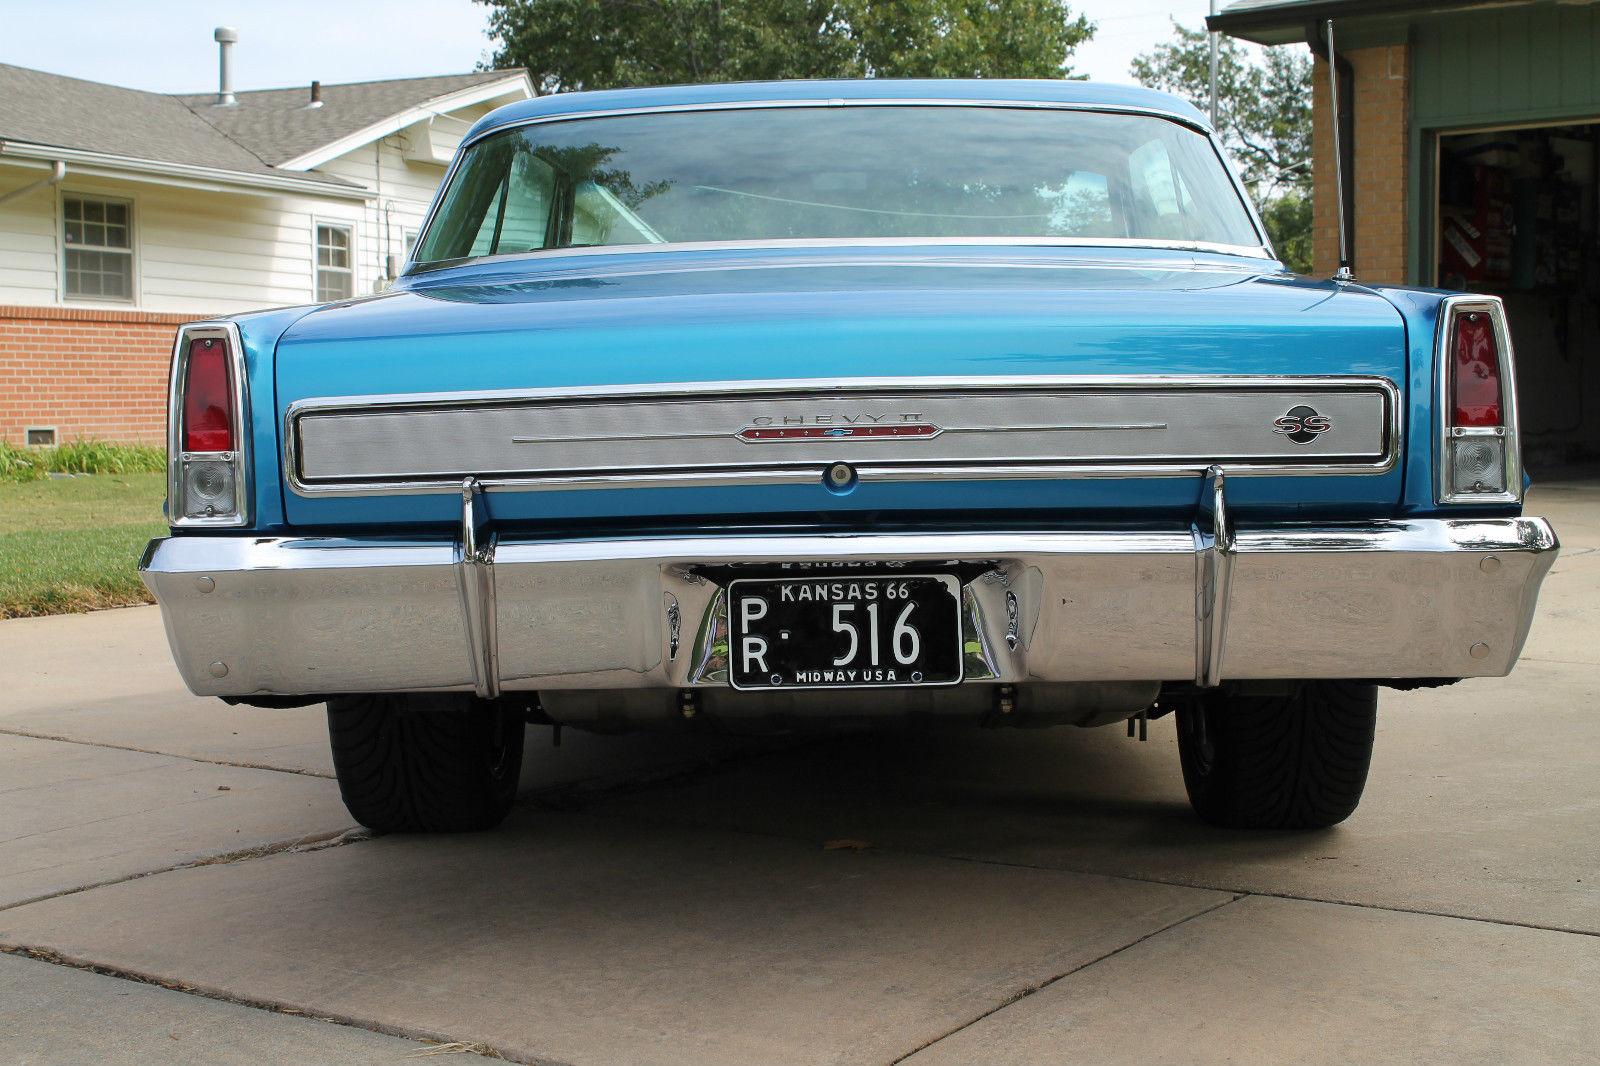 1966 Chevy Ii Nova Ss Pro Touringresto Mod Street Rodhot Rod Tpi Fuel Inject For Sale In Wichita Kansas United States